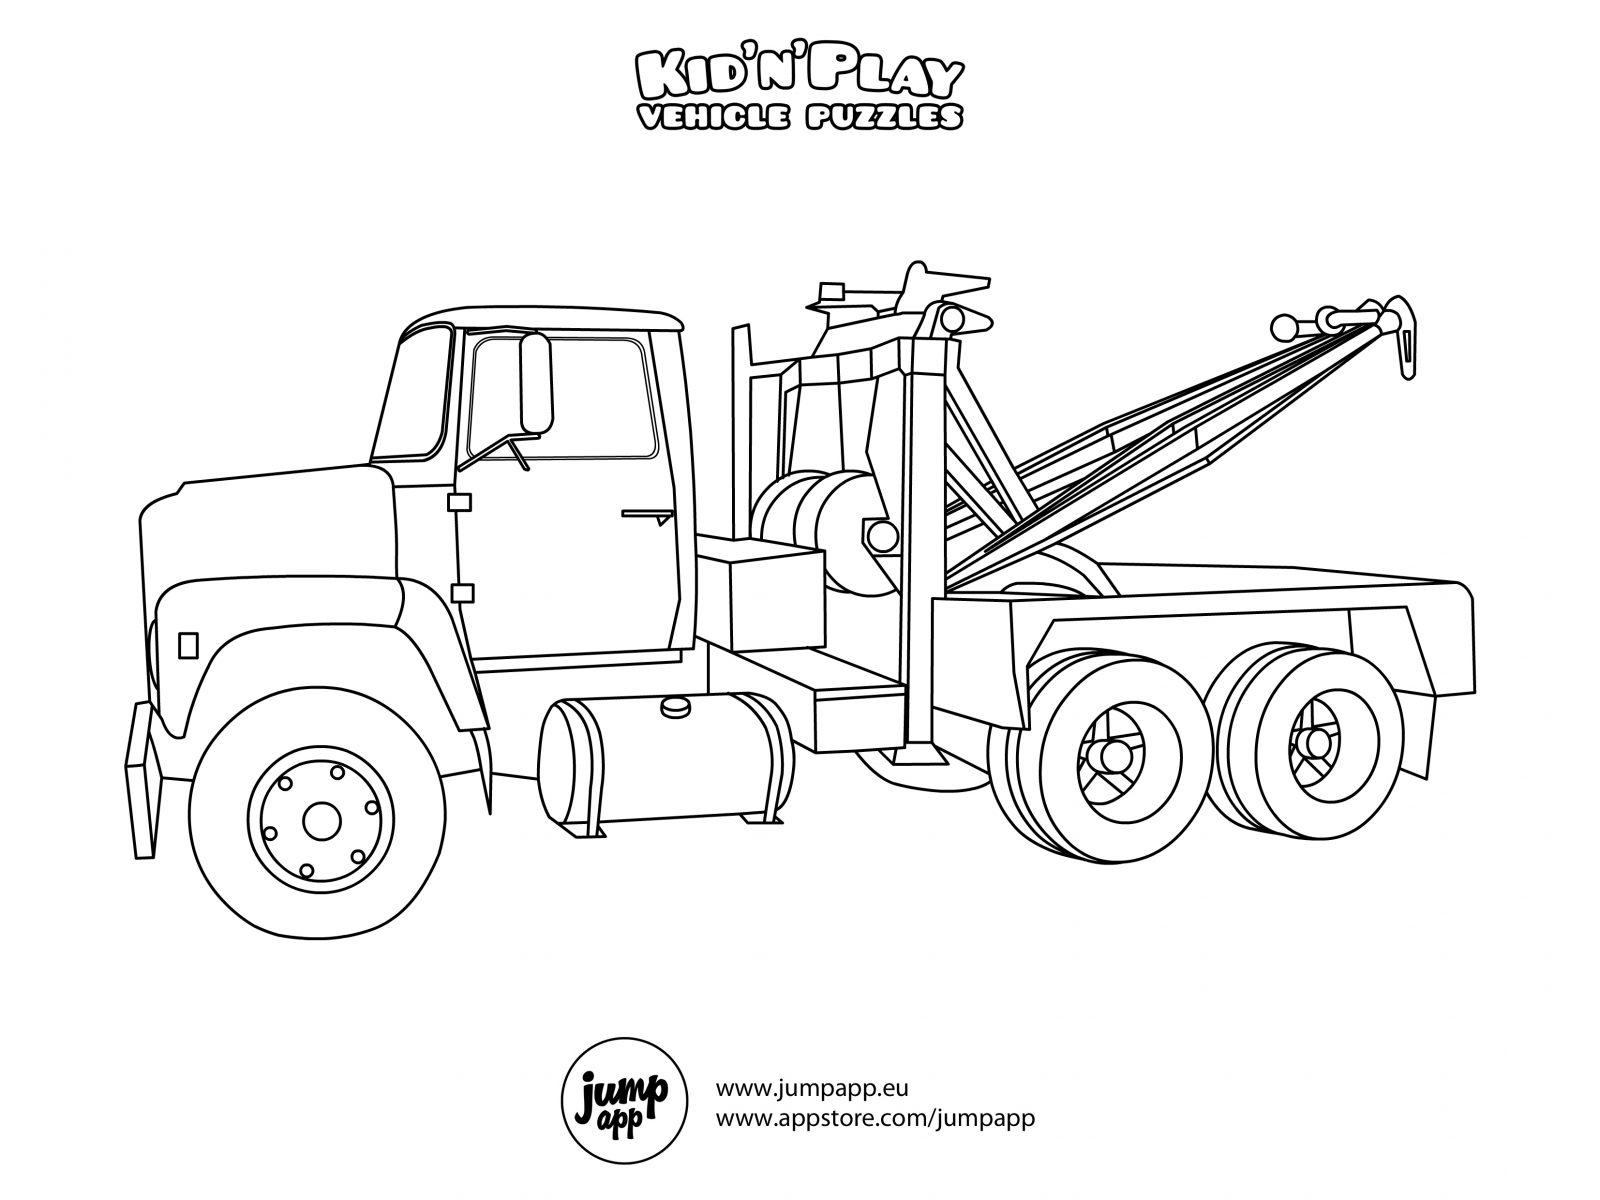 Plow Truck Drawing At Getdrawings